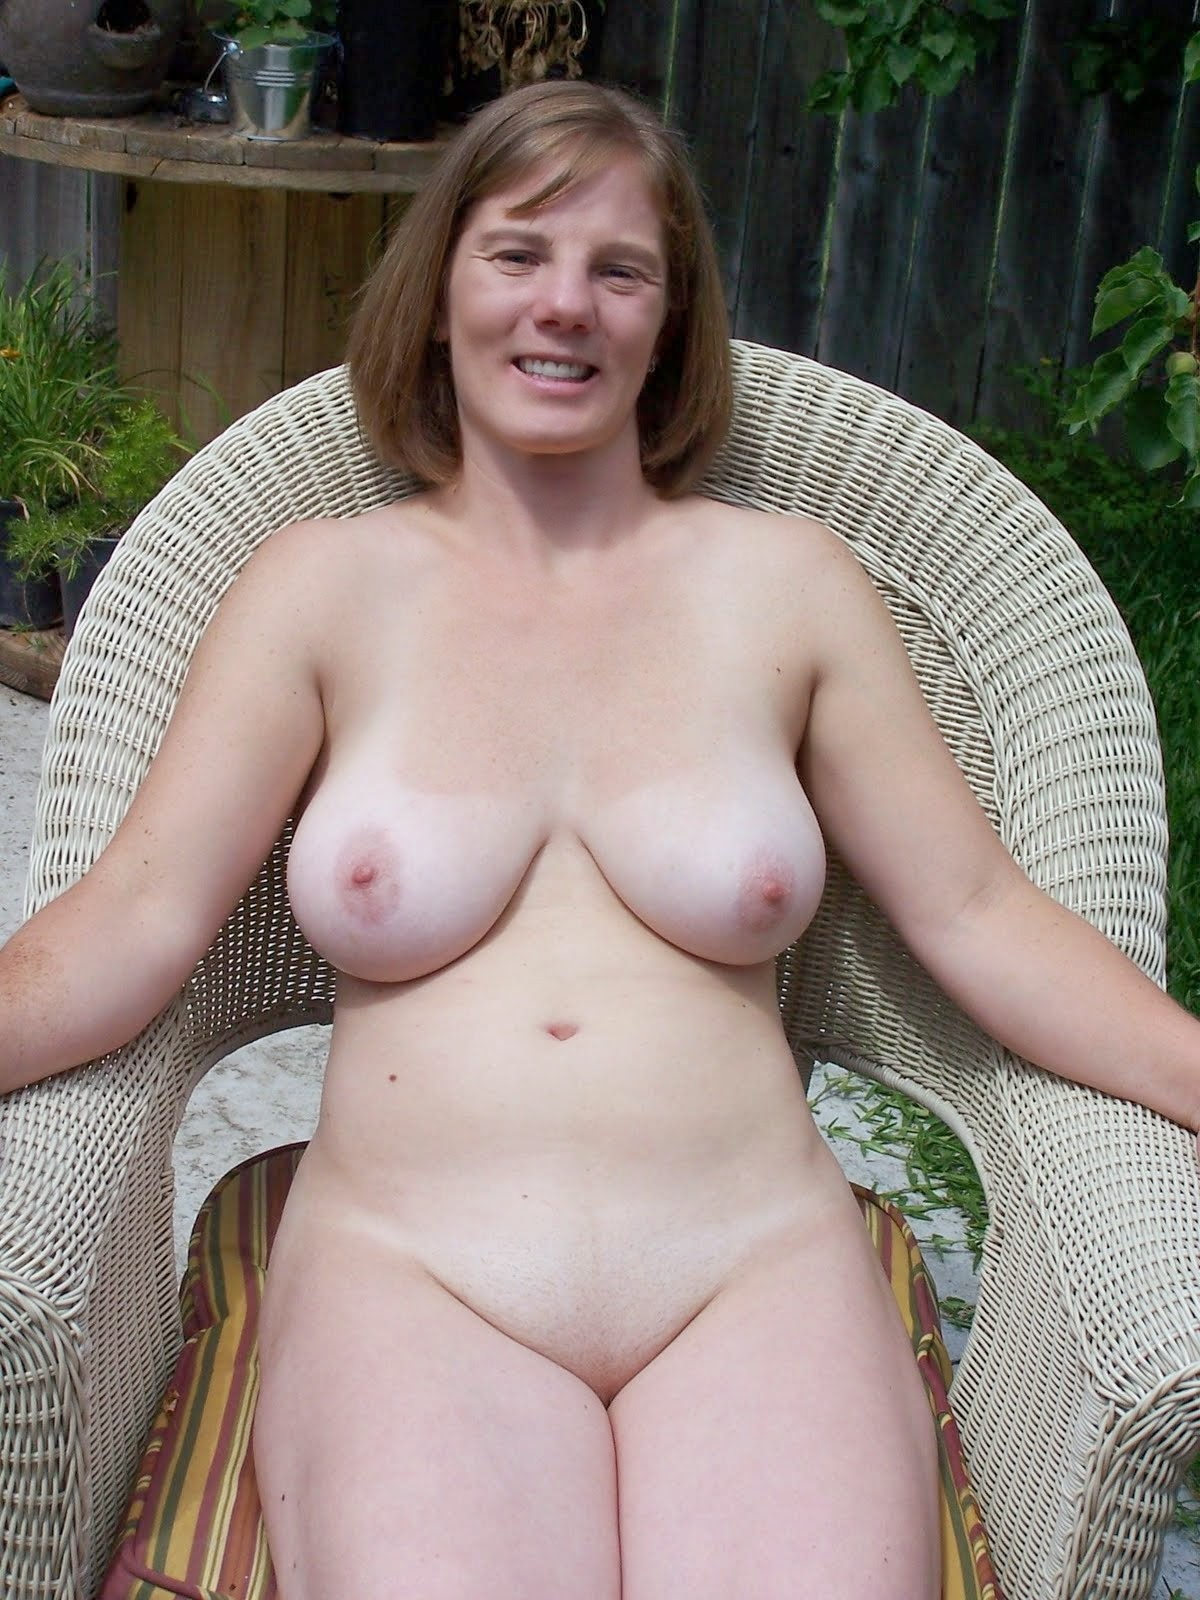 Giant silicone boob